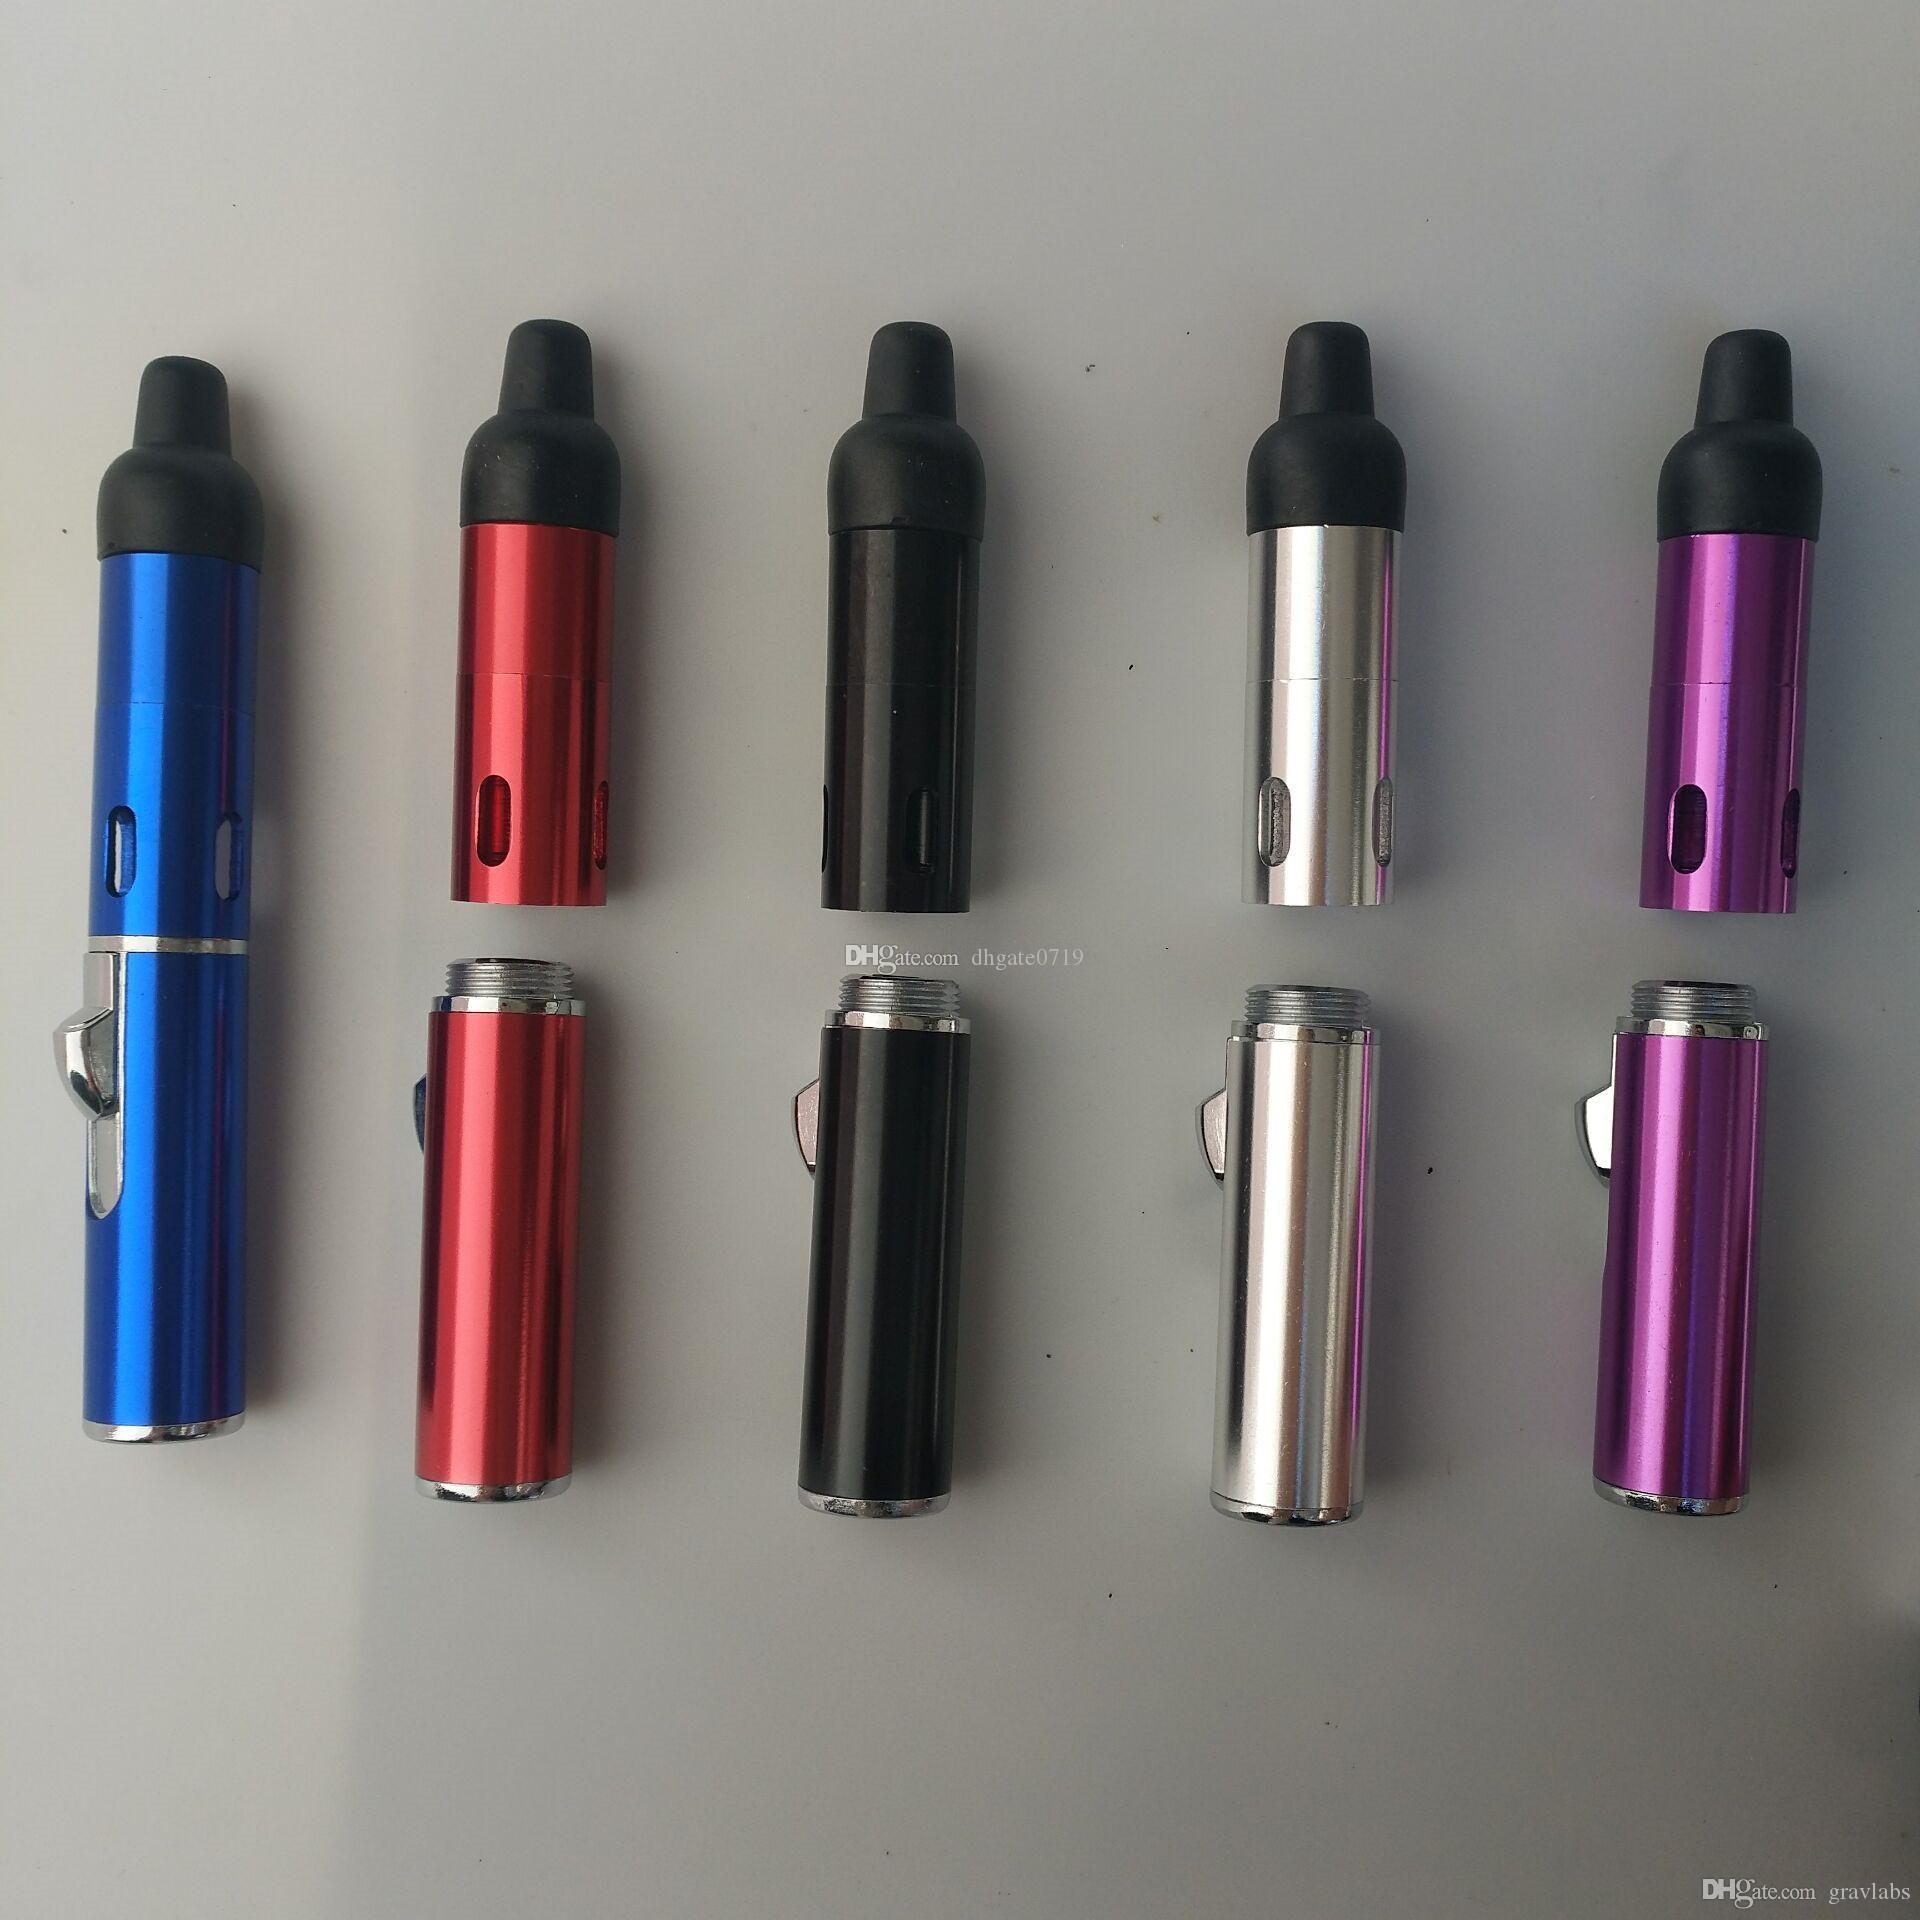 Smoking Pipe Click N Vape Sneak A Vape Sneak A Toke Herbal Vaporizer E-Cigarette Water and Wind Proof Torch Lighter Free Shipping